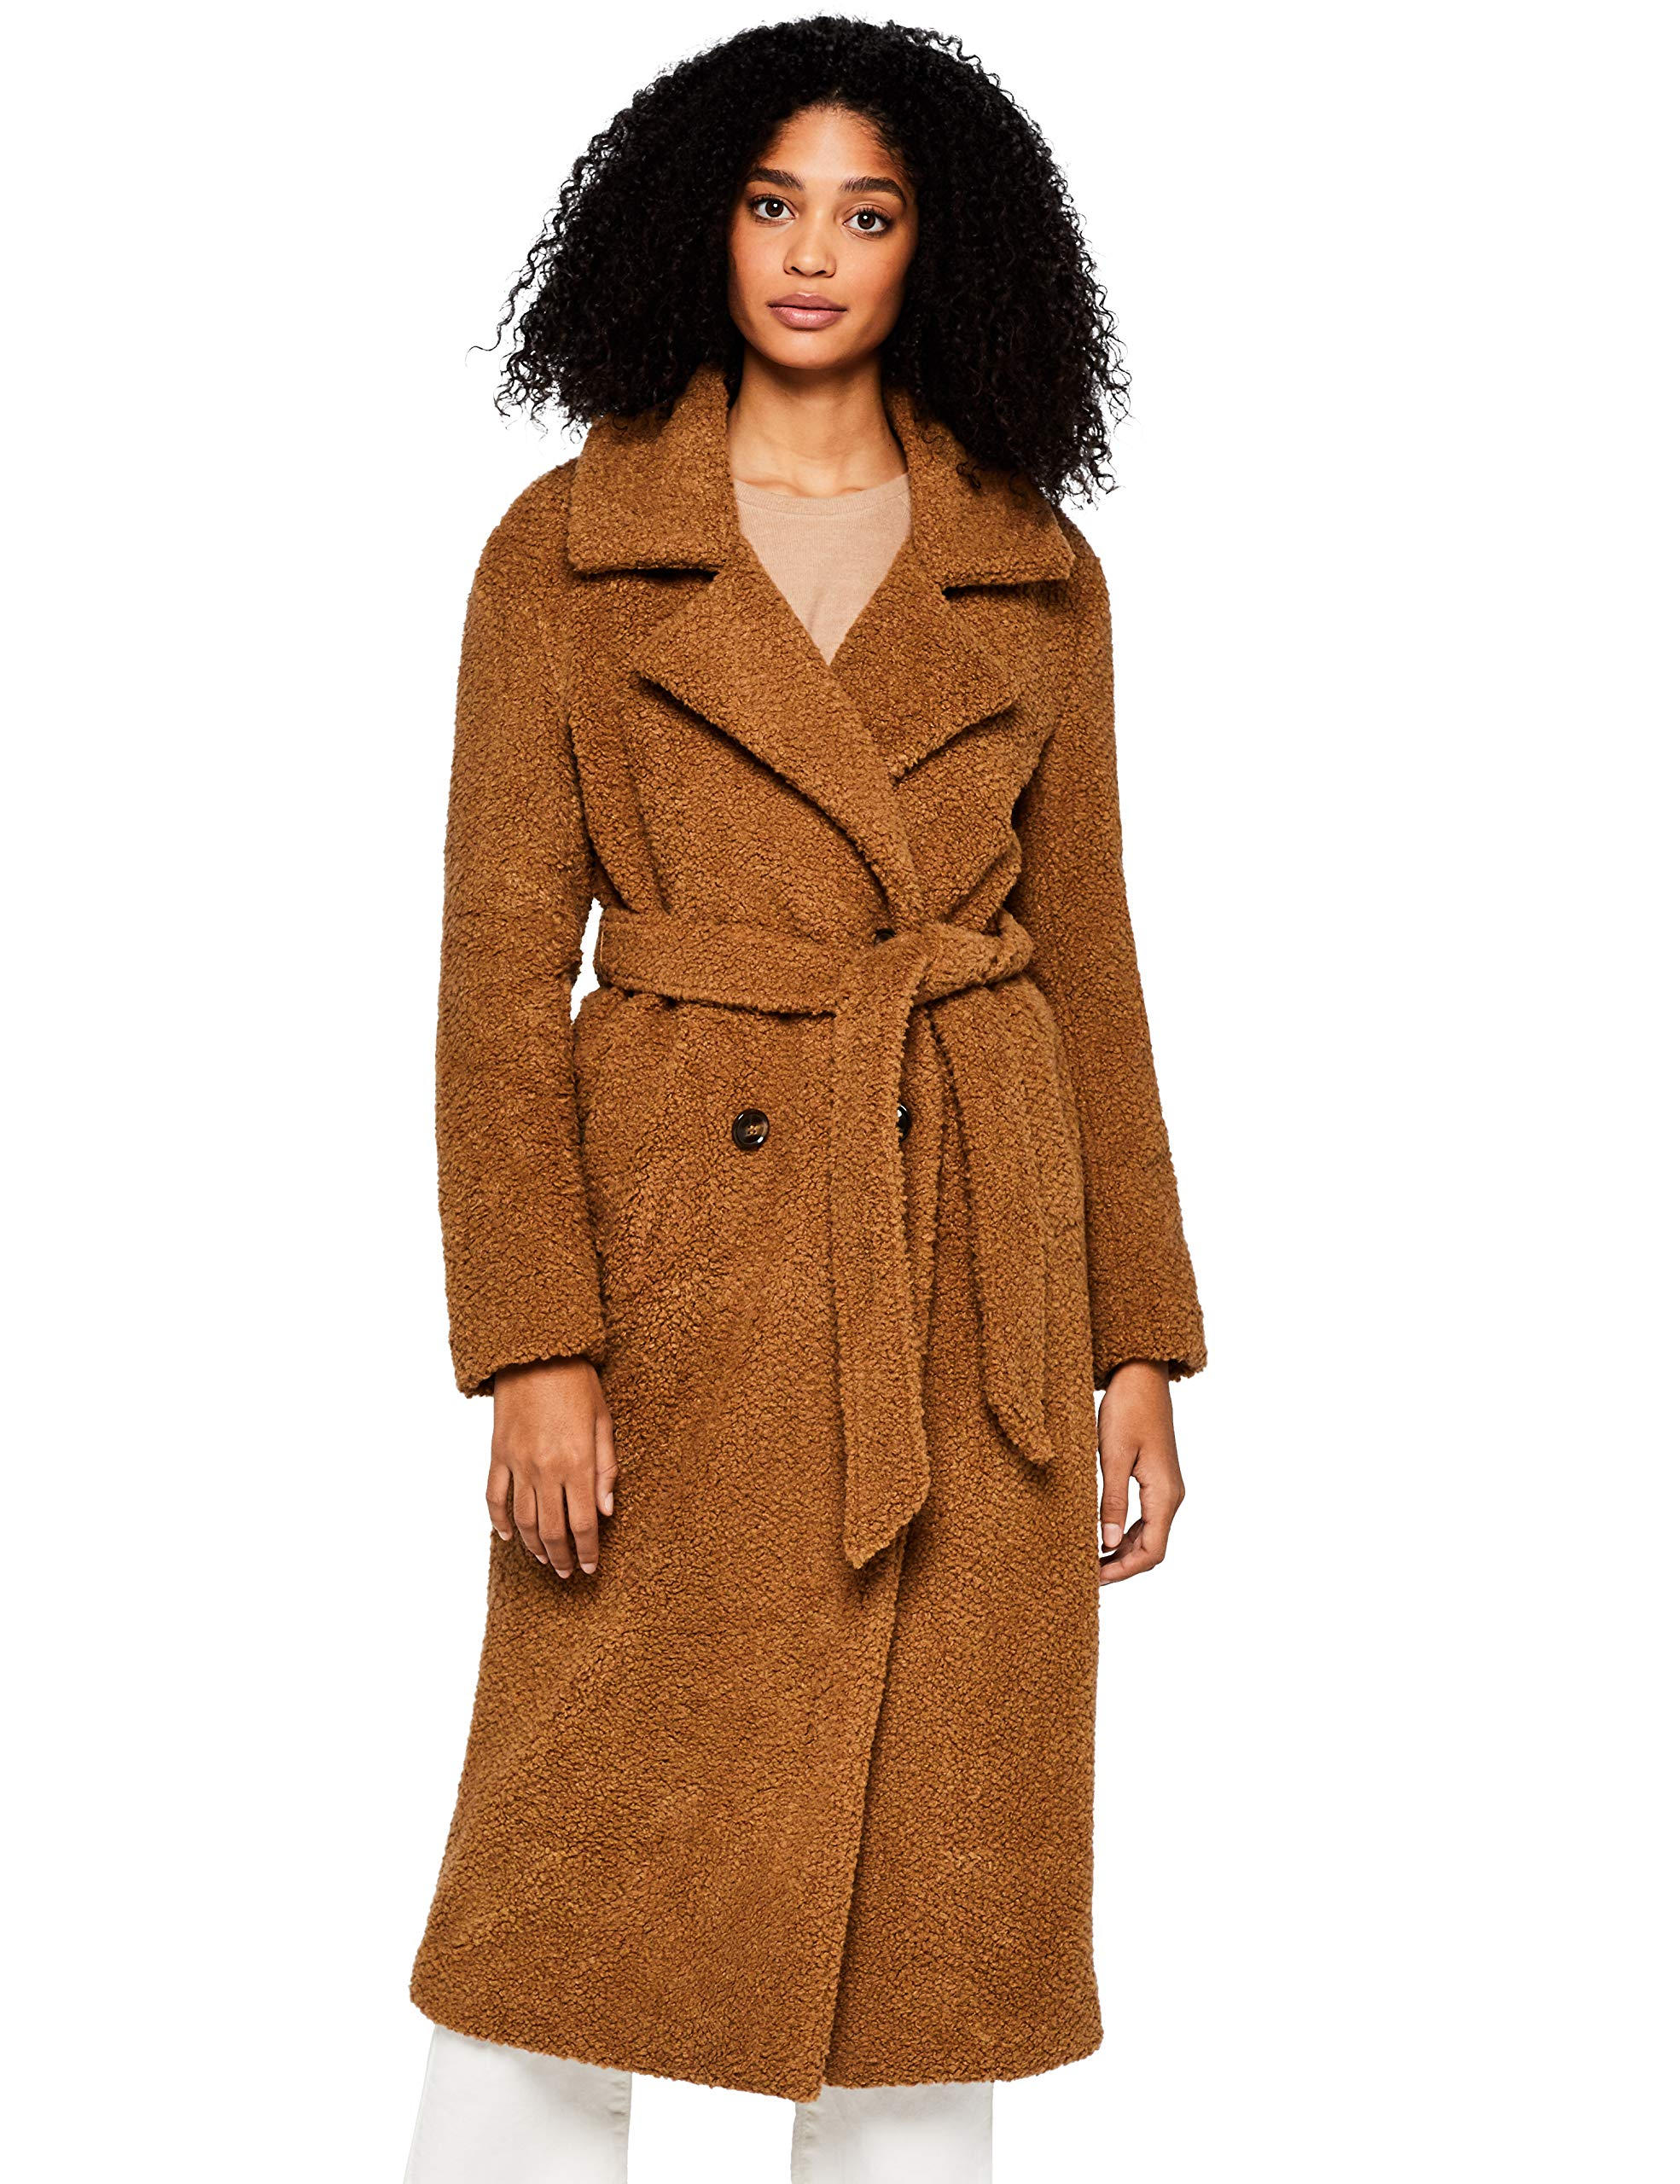 Coat FindLongline Brown42taille Teddy FabricantLarge BlousonMarron xhQrtCsd